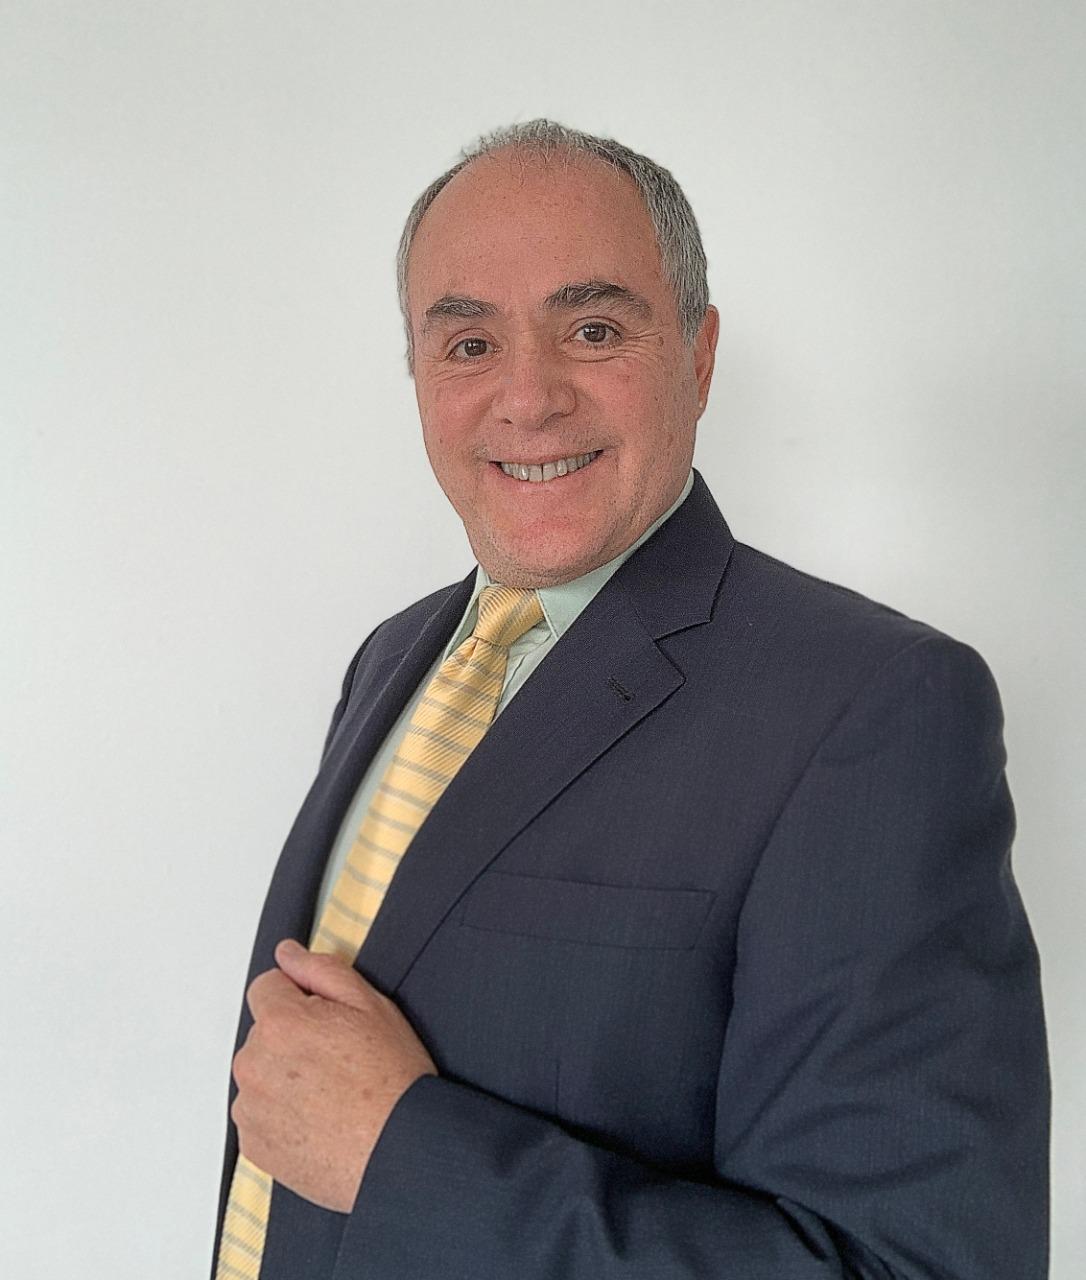 Juan Antonio Edwards